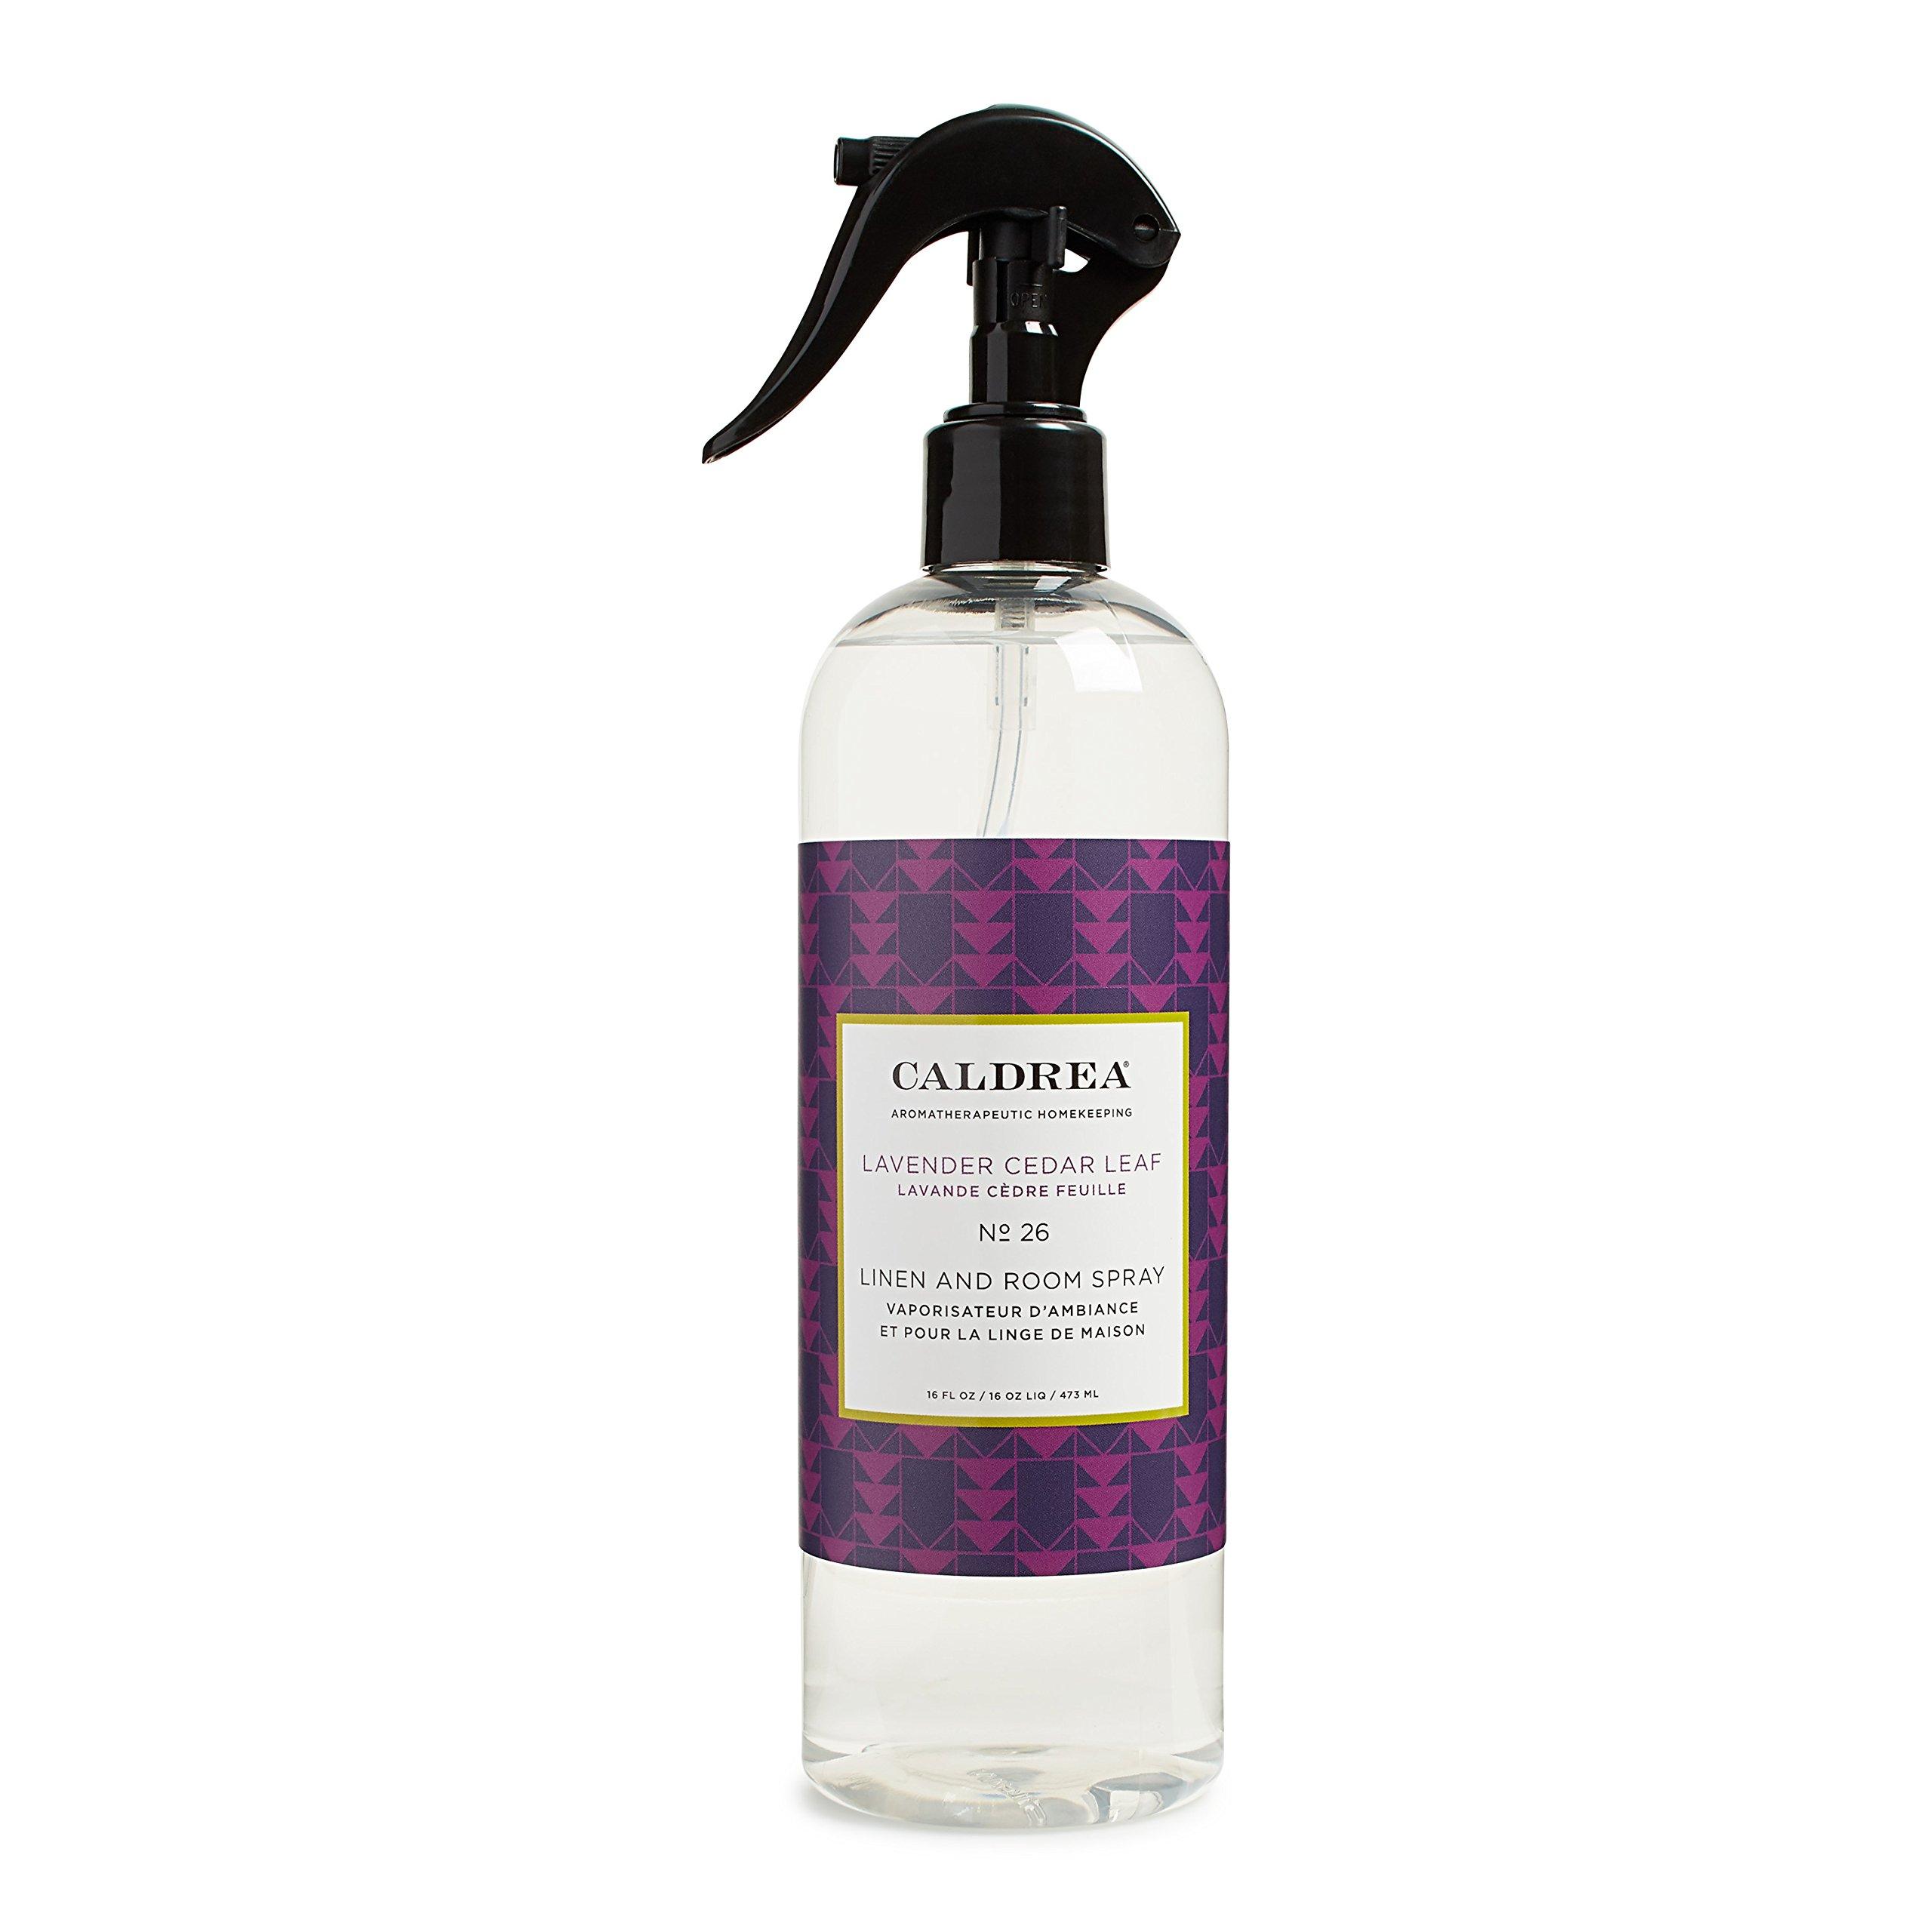 Caldrea Linen and Room Spray, Lavender Cedar Leaf, 16 oz by Caldrea